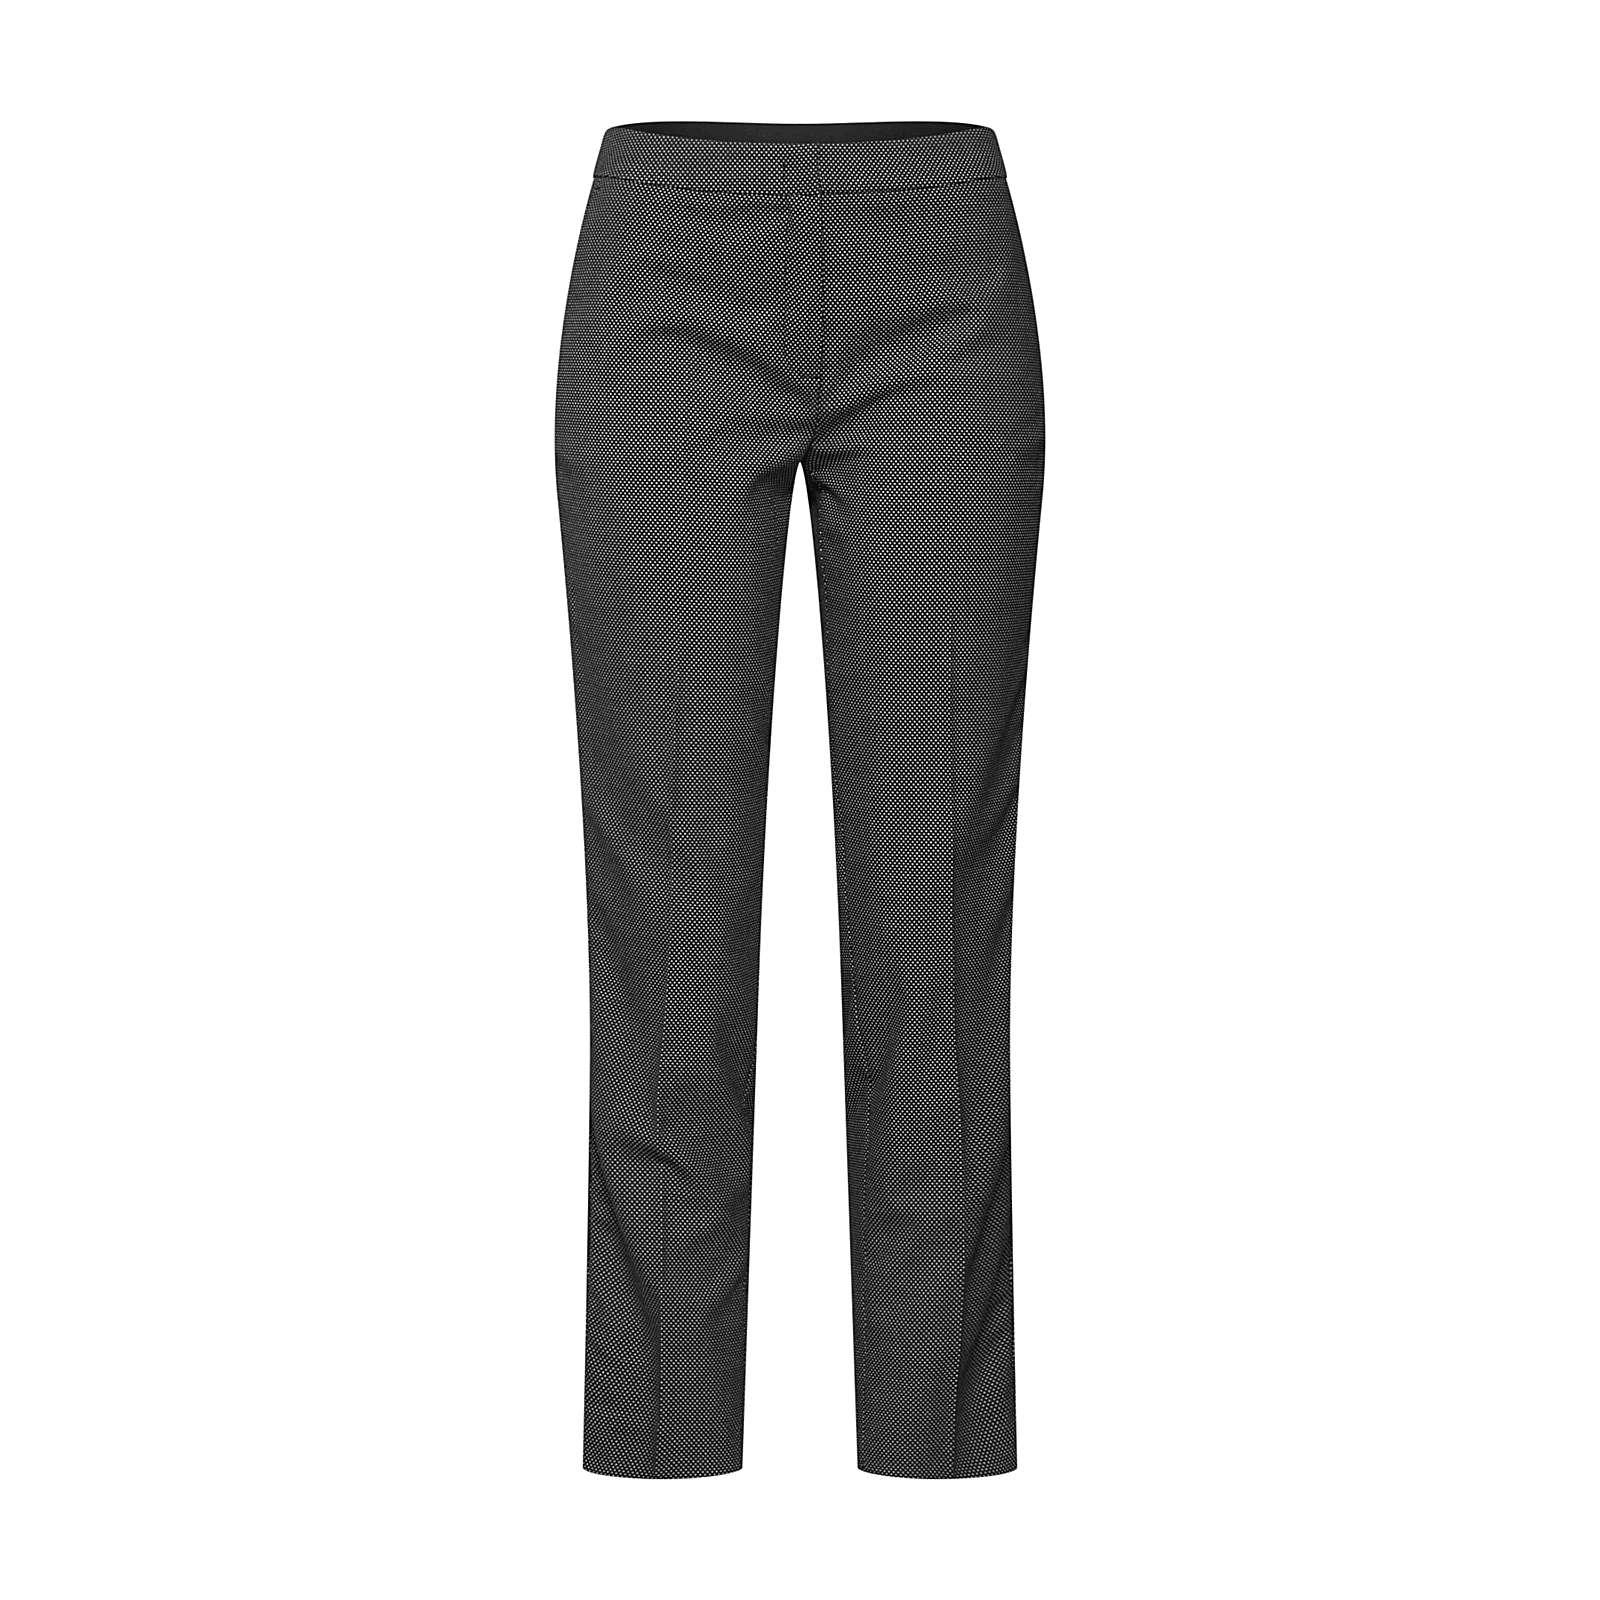 MORE & MORE Bügelfaltenhose 3/4-Hosen schwarz Damen Gr. 52